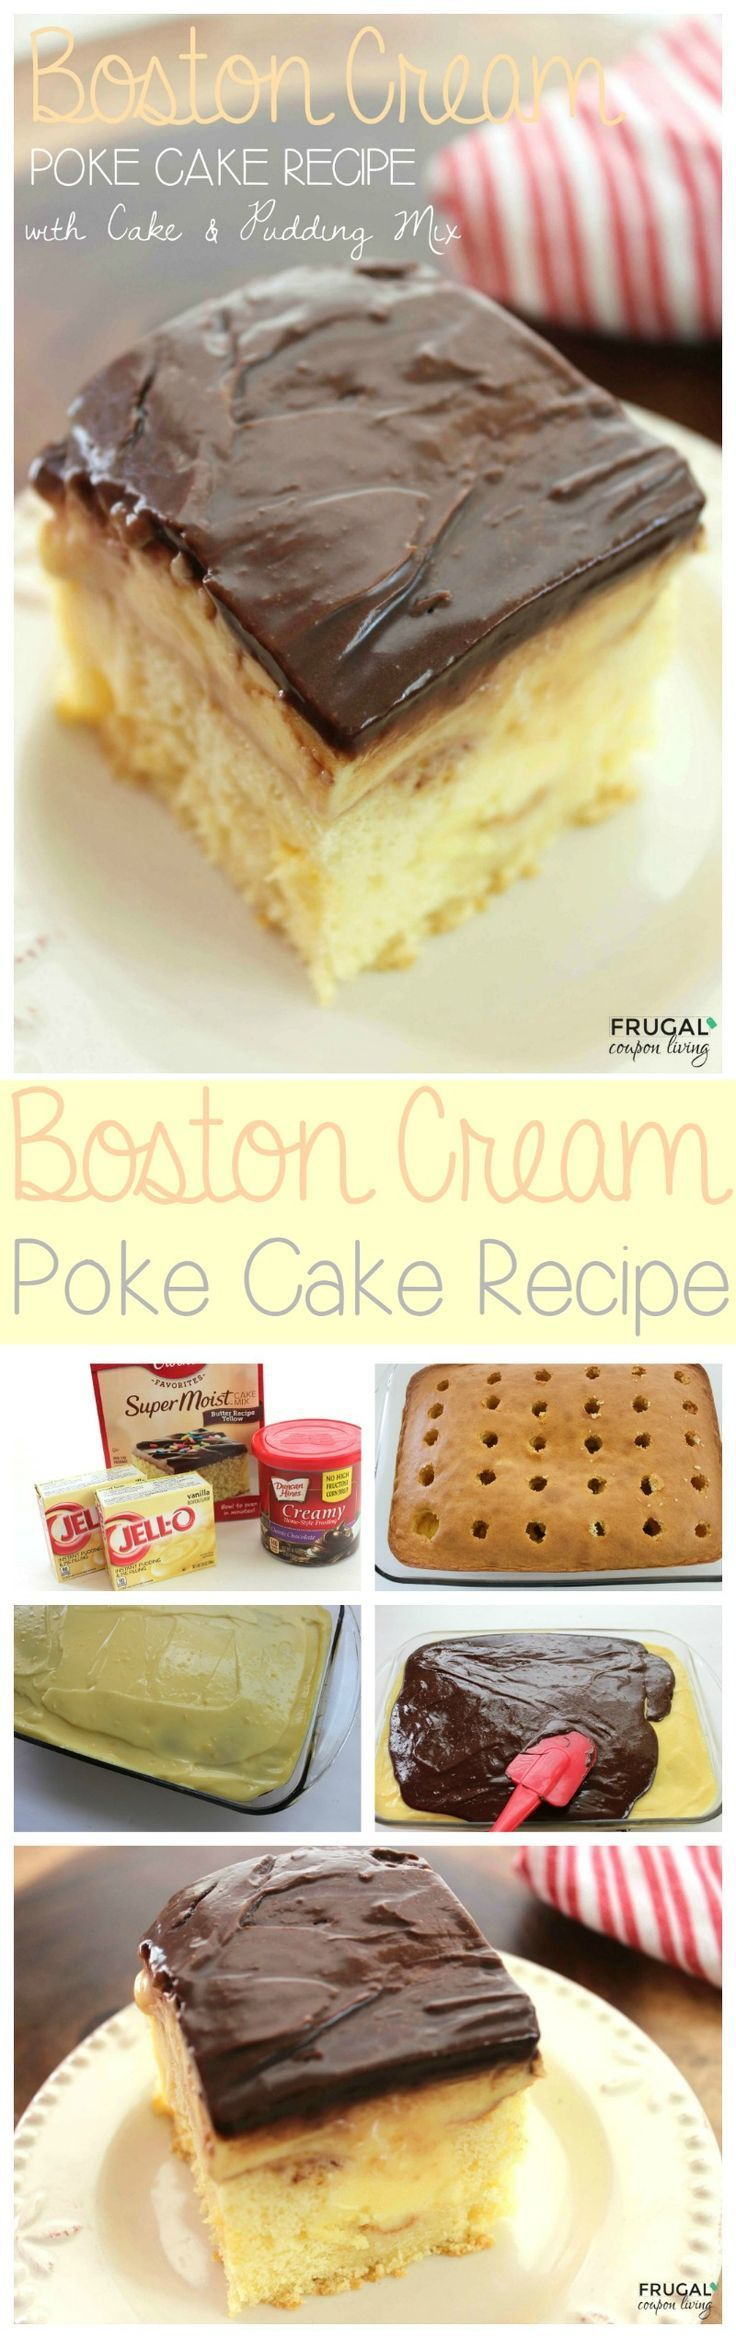 Cake recipe pudding added